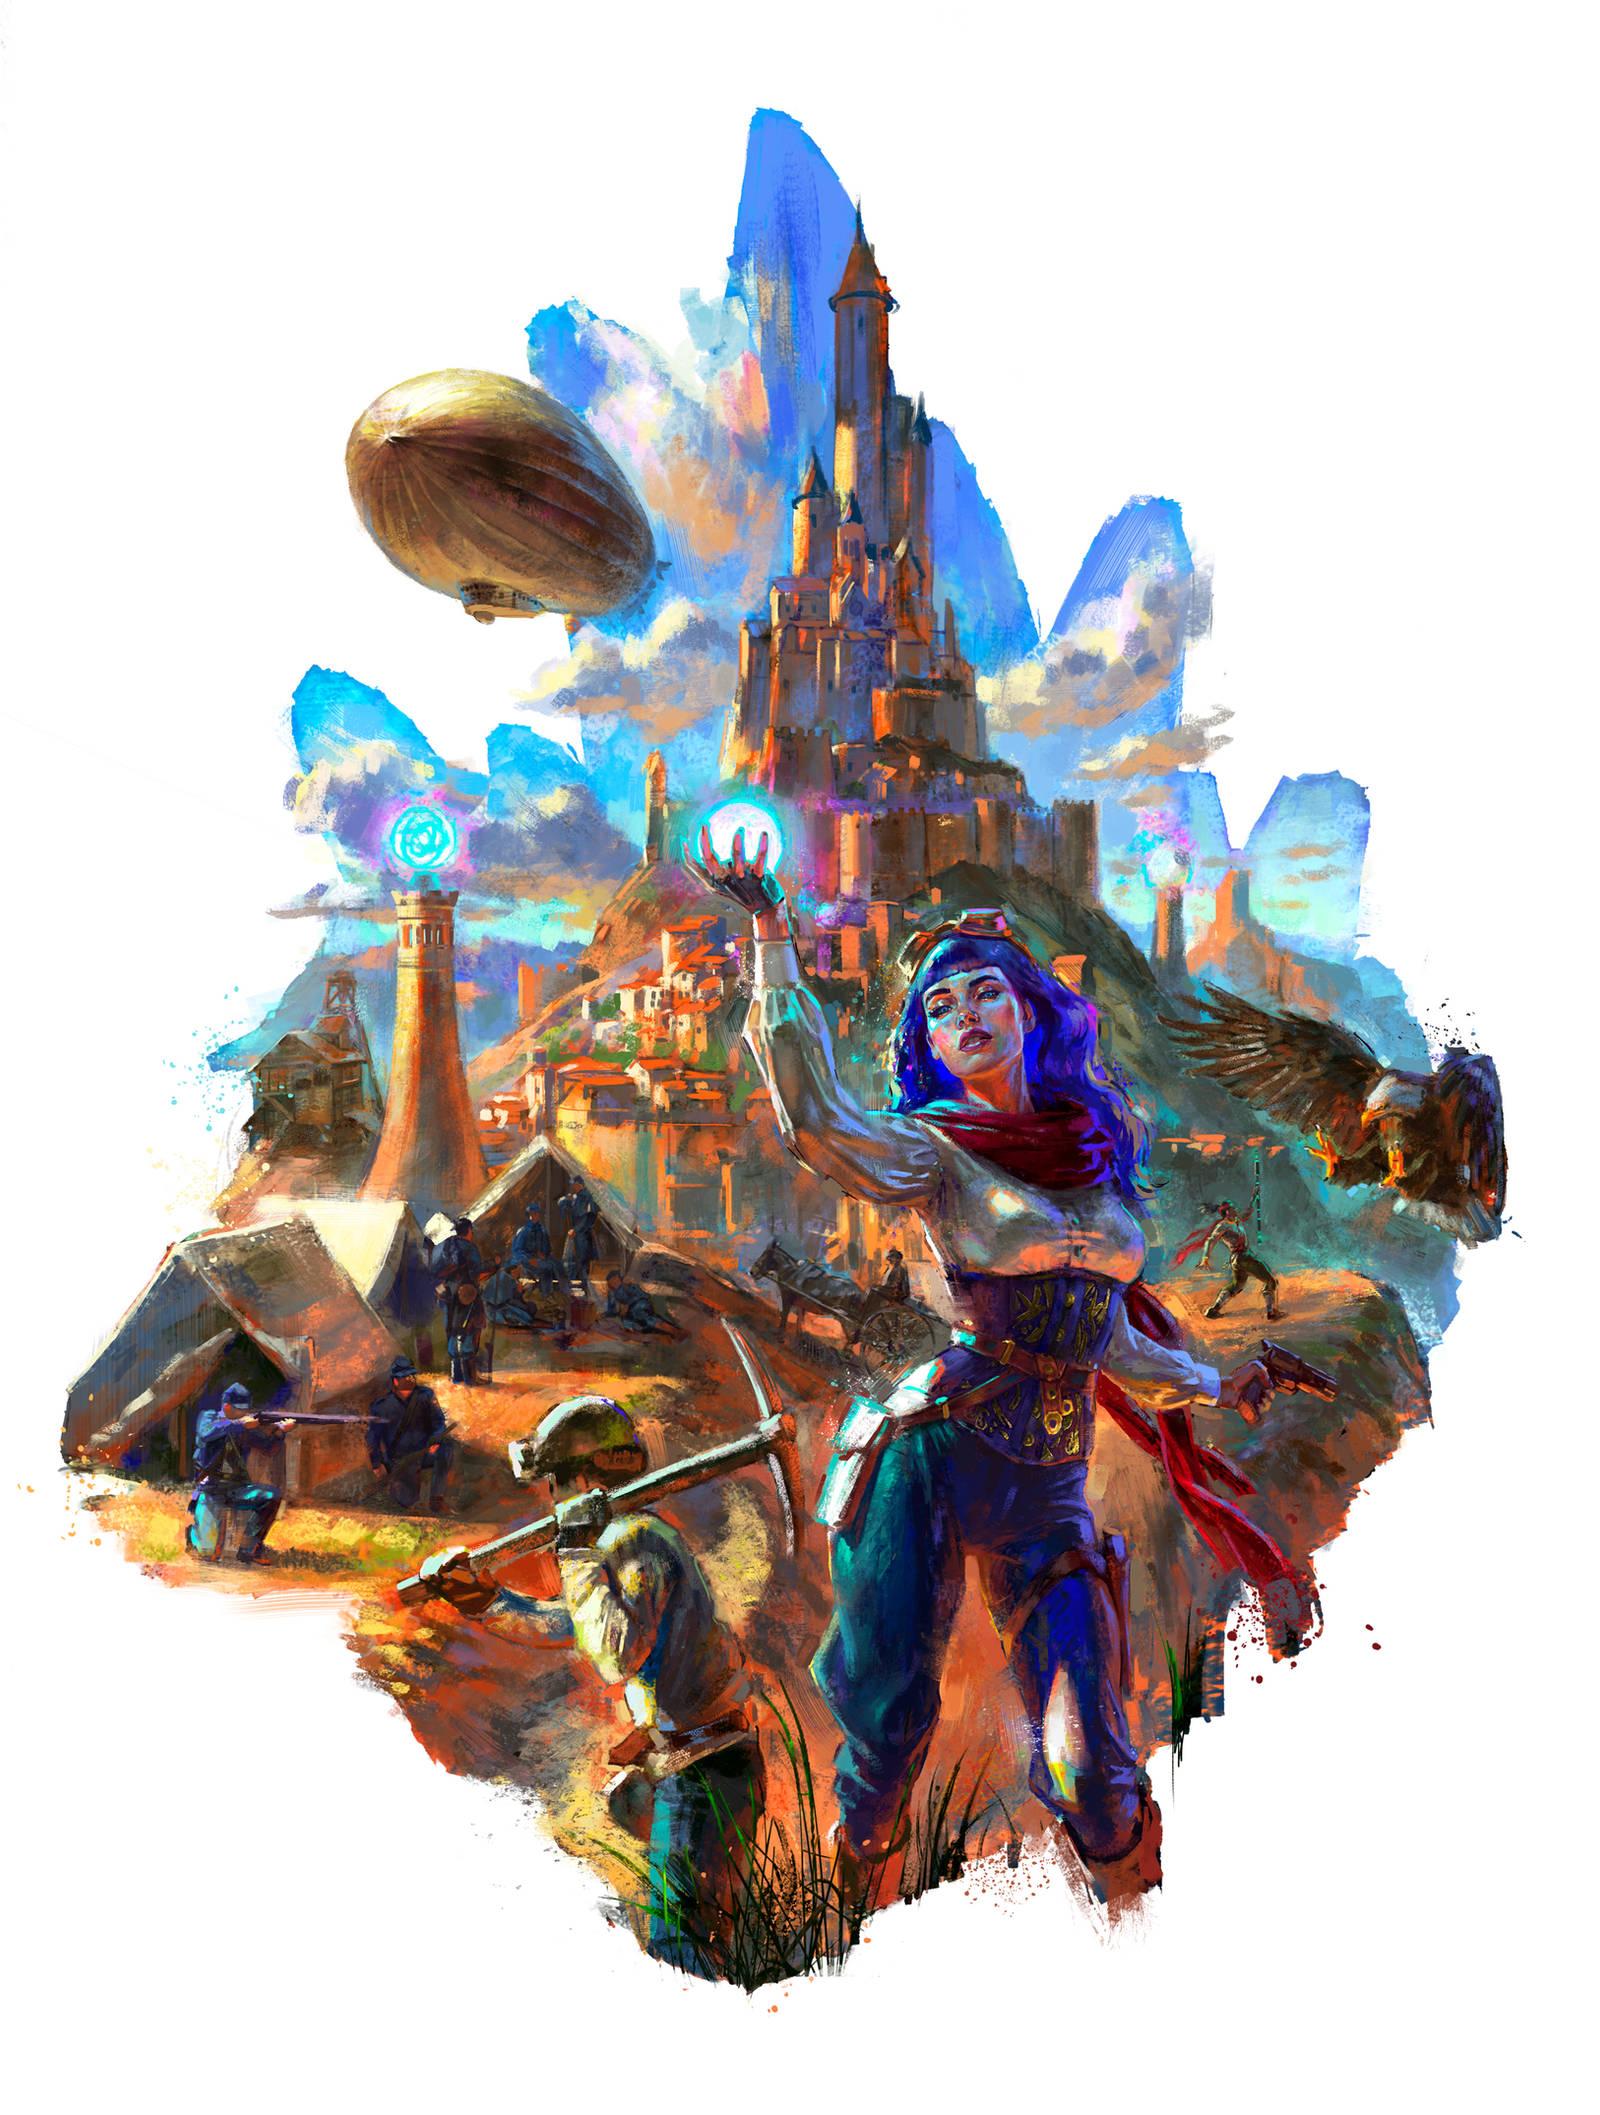 BOREAL GAMES - Promo illustration by MartaNael